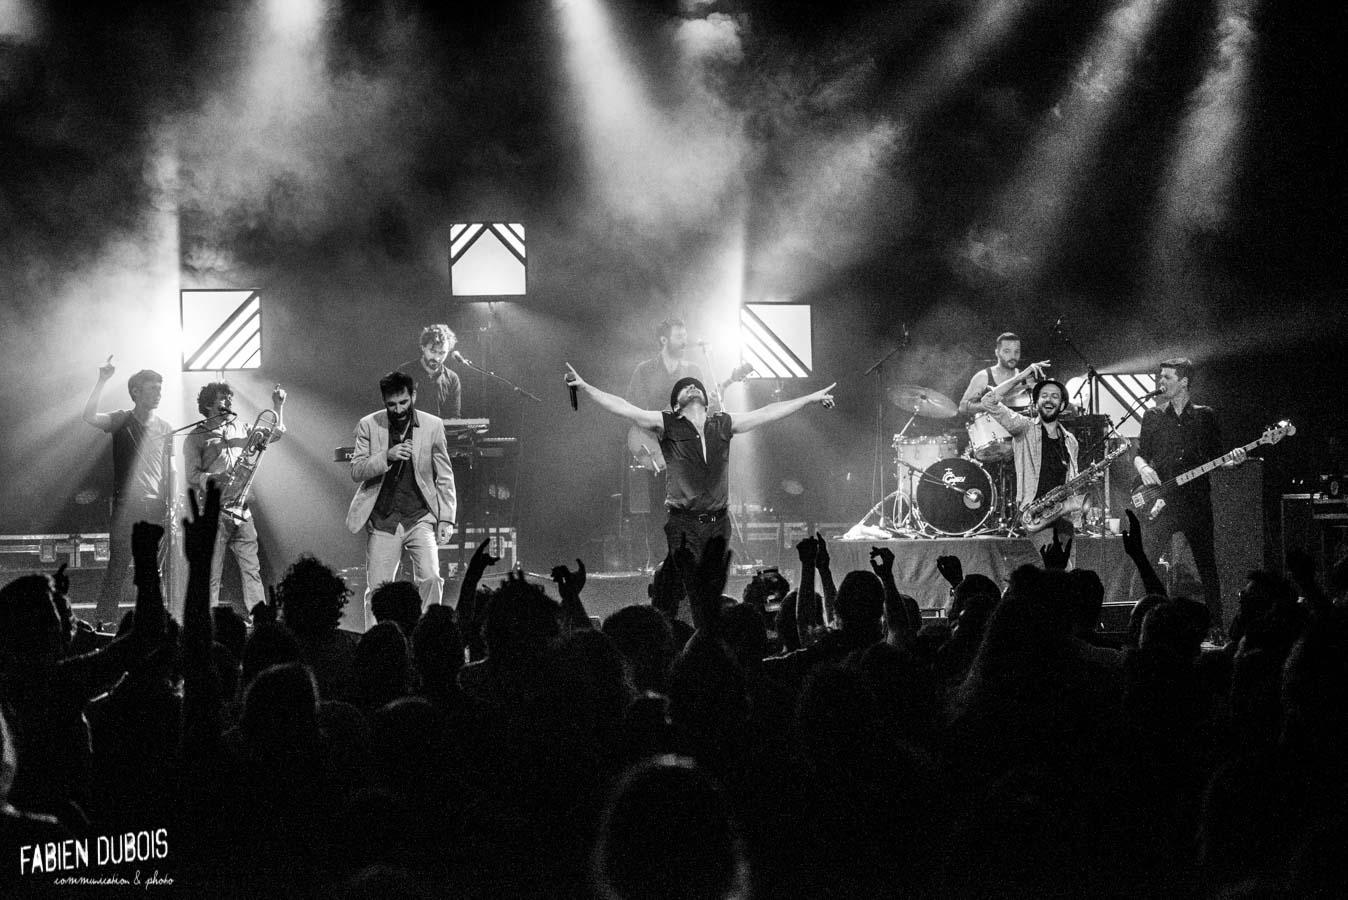 Photo Babylon Circus Transbordeur 20 ans Médiatone Villeurbanne Lyon France 2017